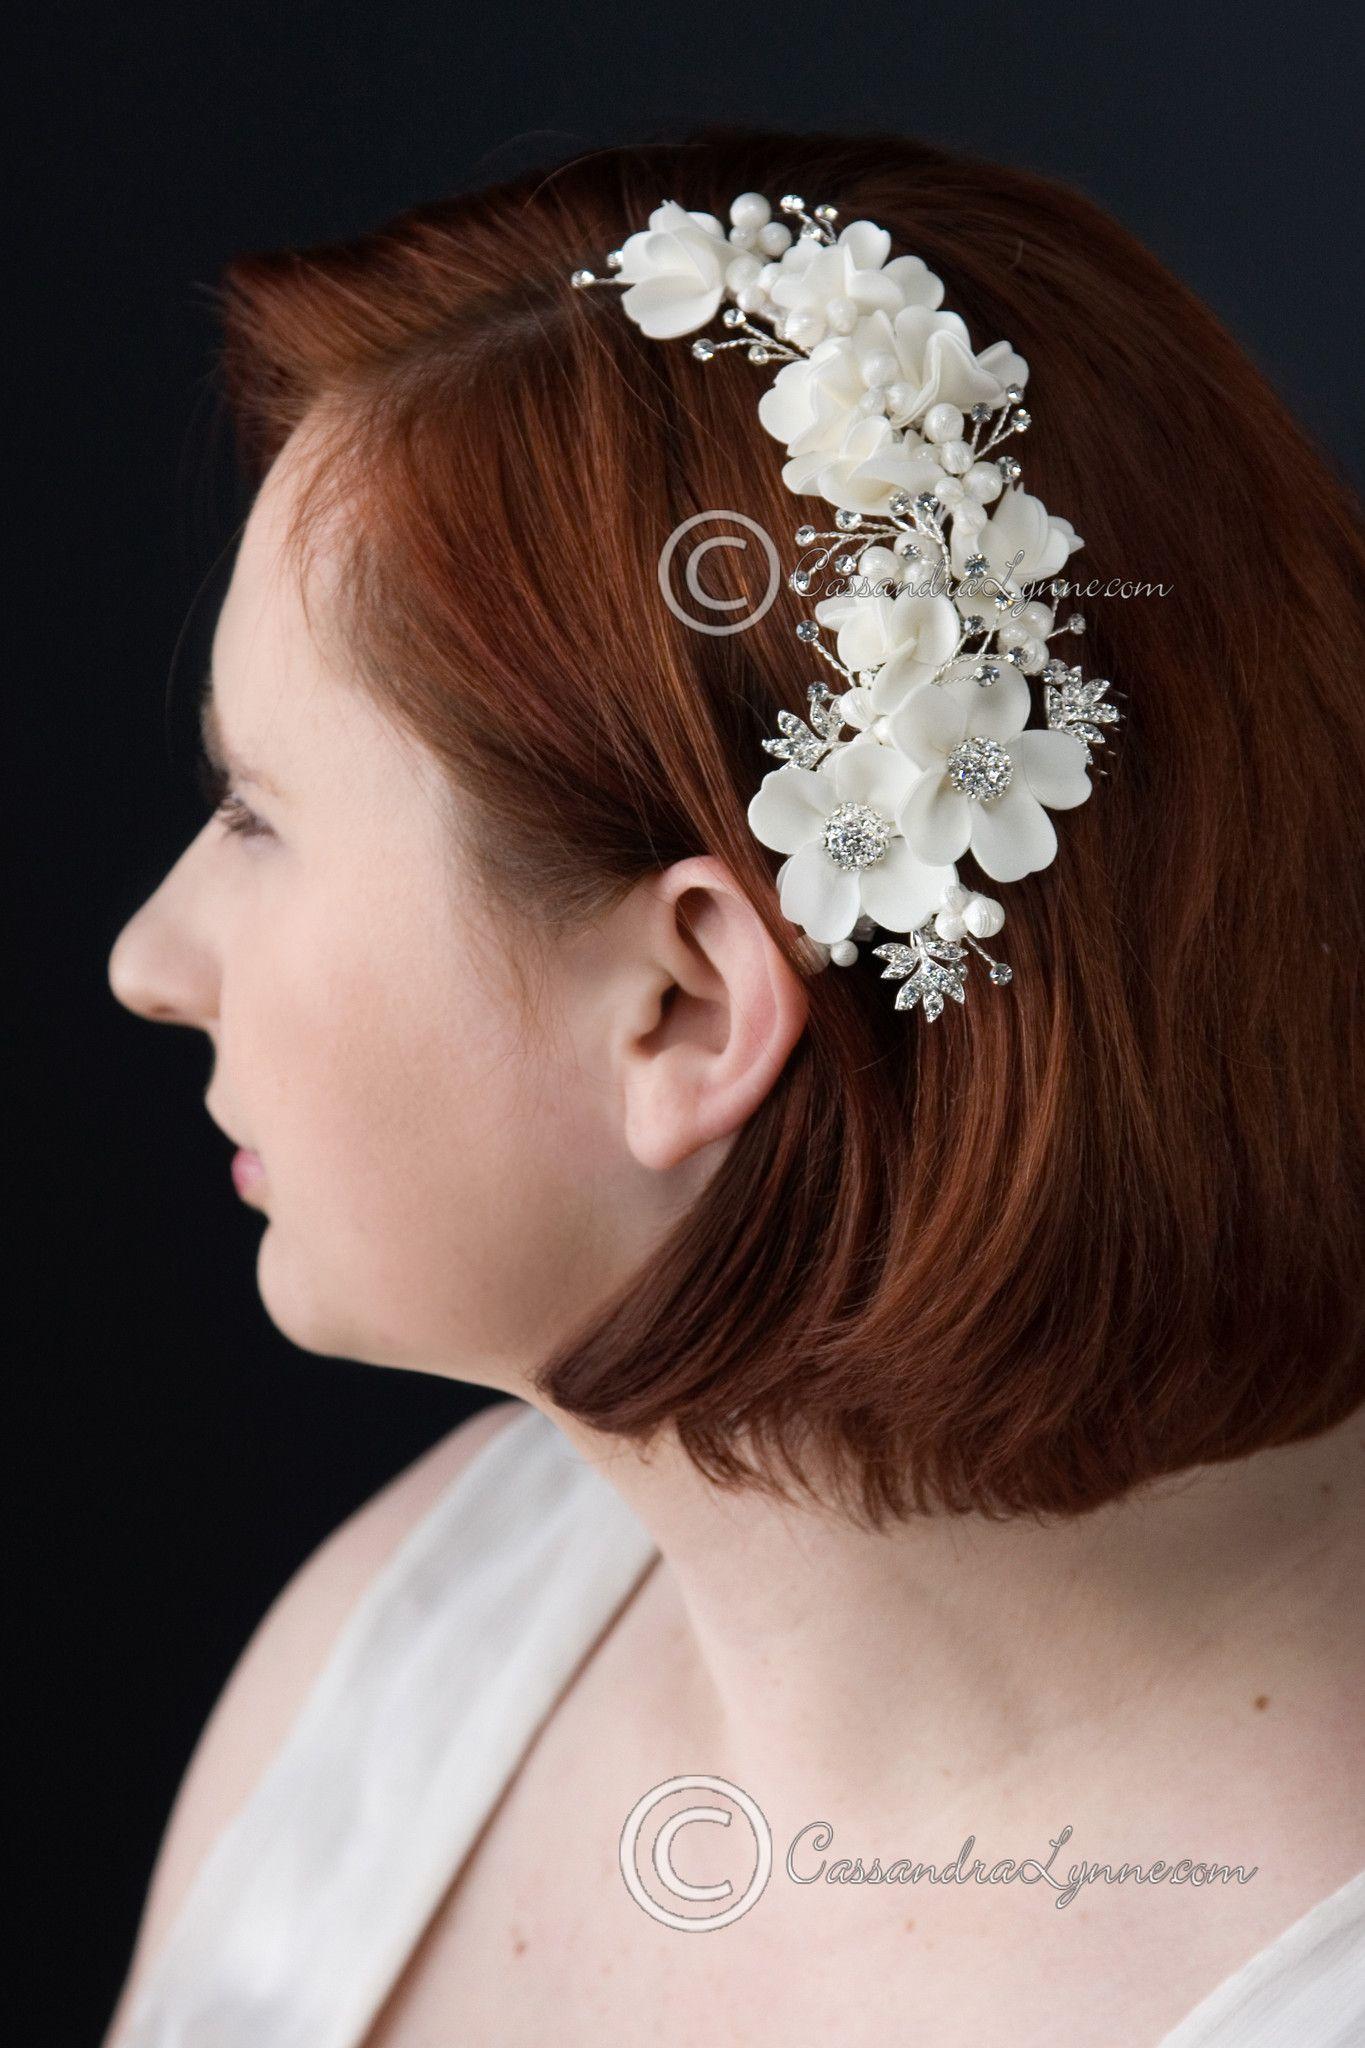 Bridal Comb with Satin Flowers Rhinestones & Fabric Pearls | Satin ...